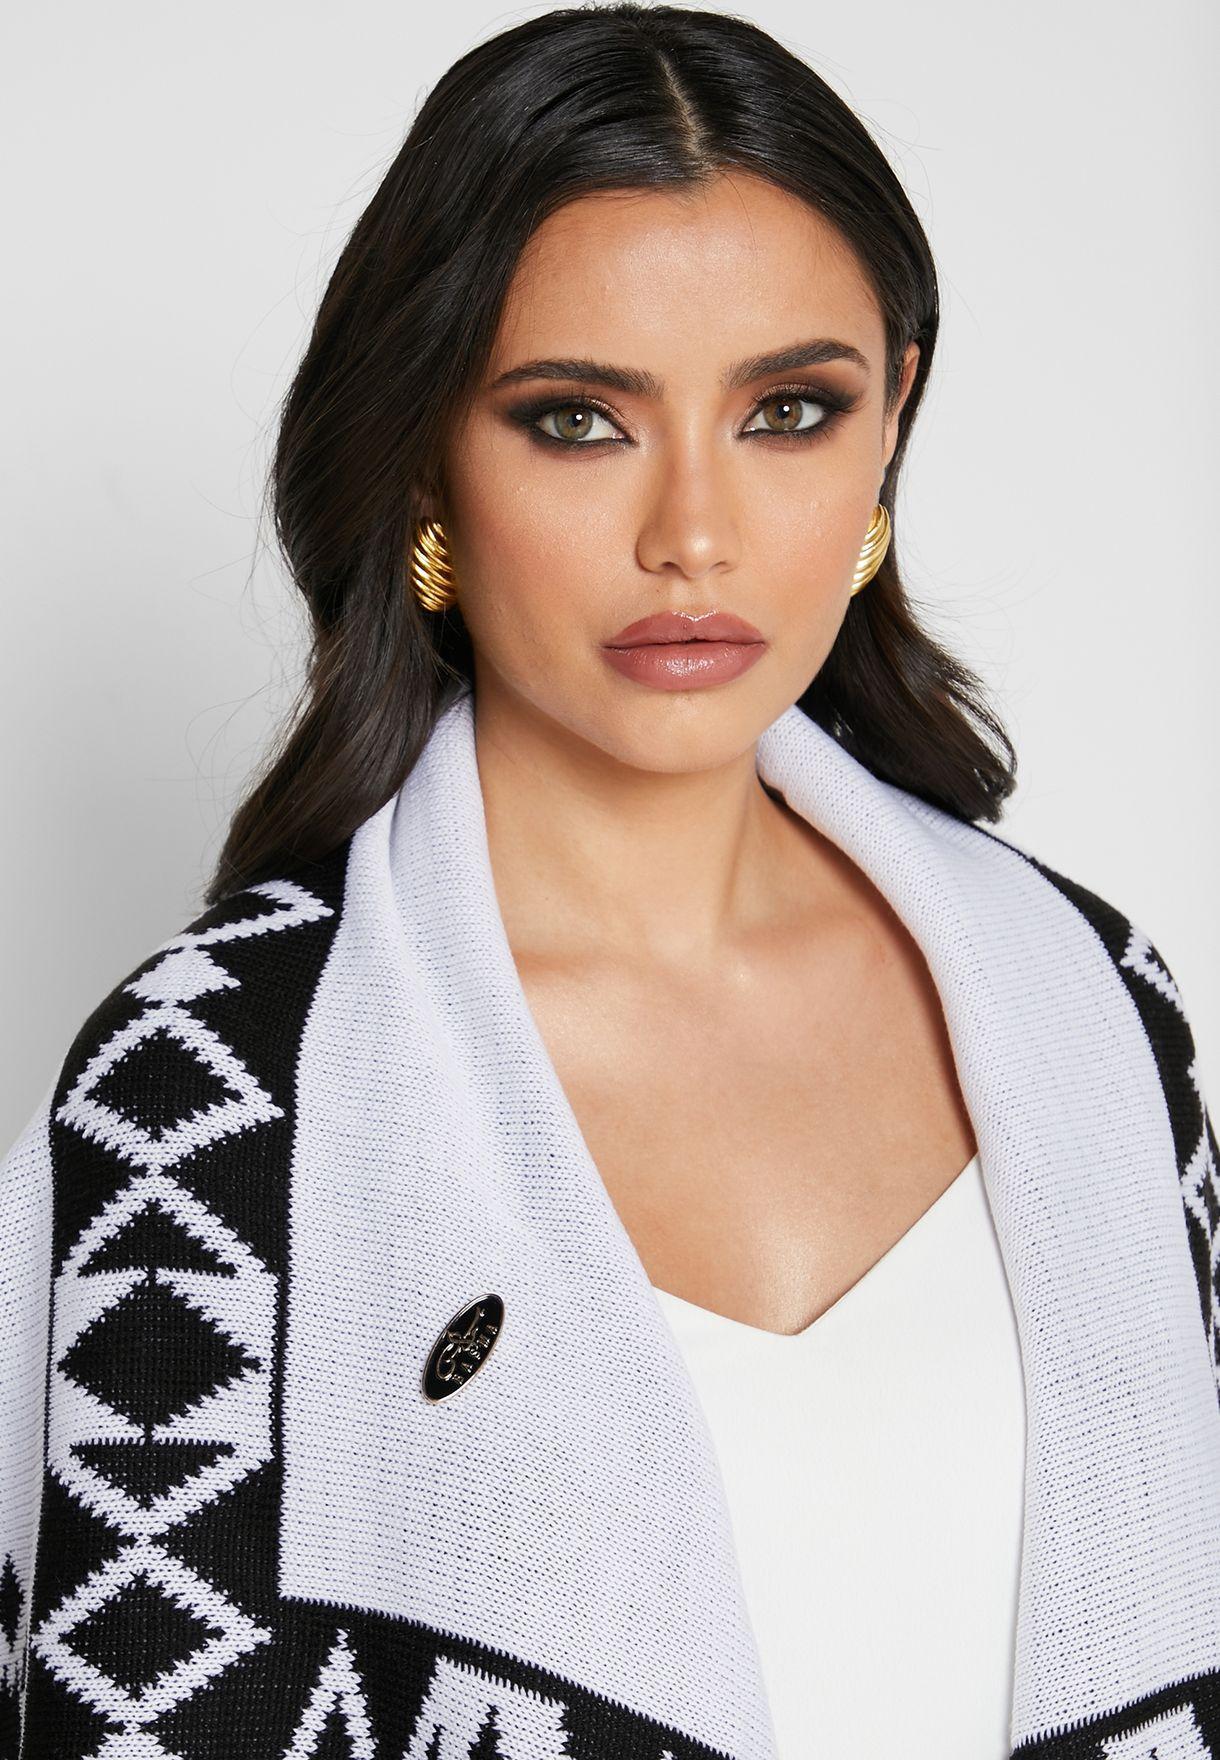 Waterfall Knitted Woollen Abaya